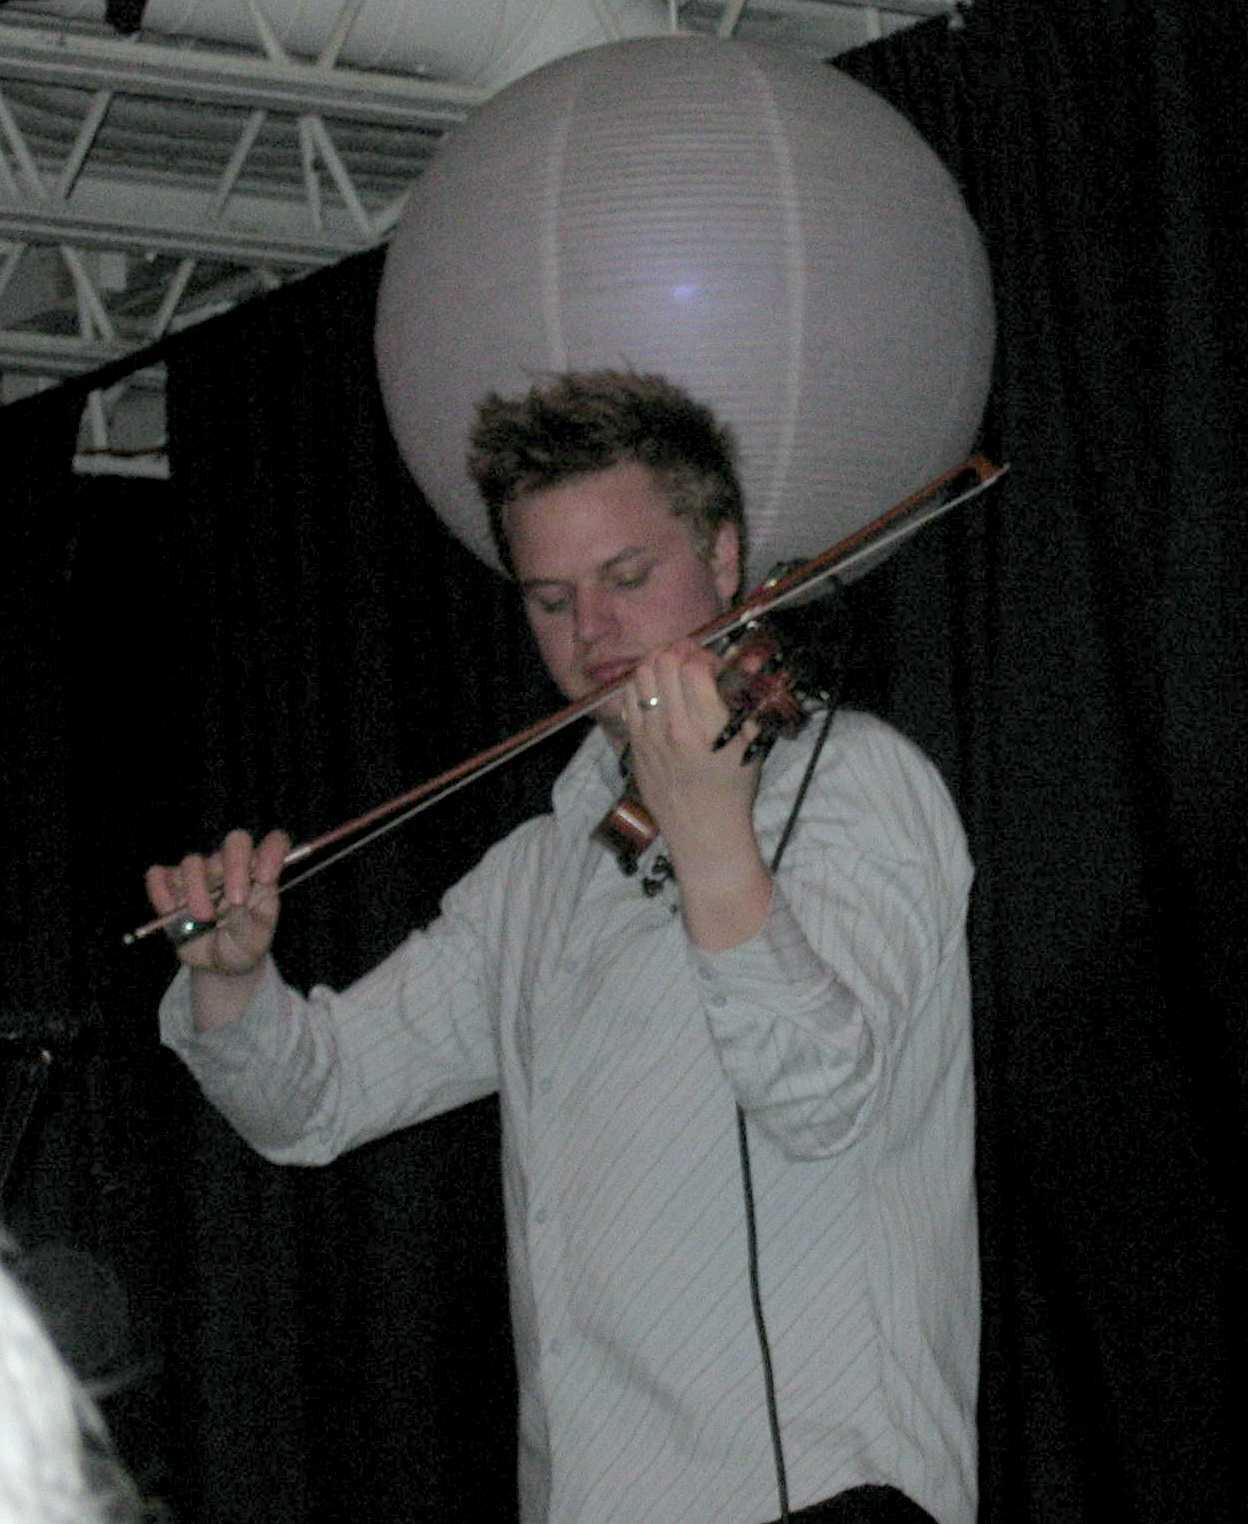 Jeremy Penner at Gravity Lounge